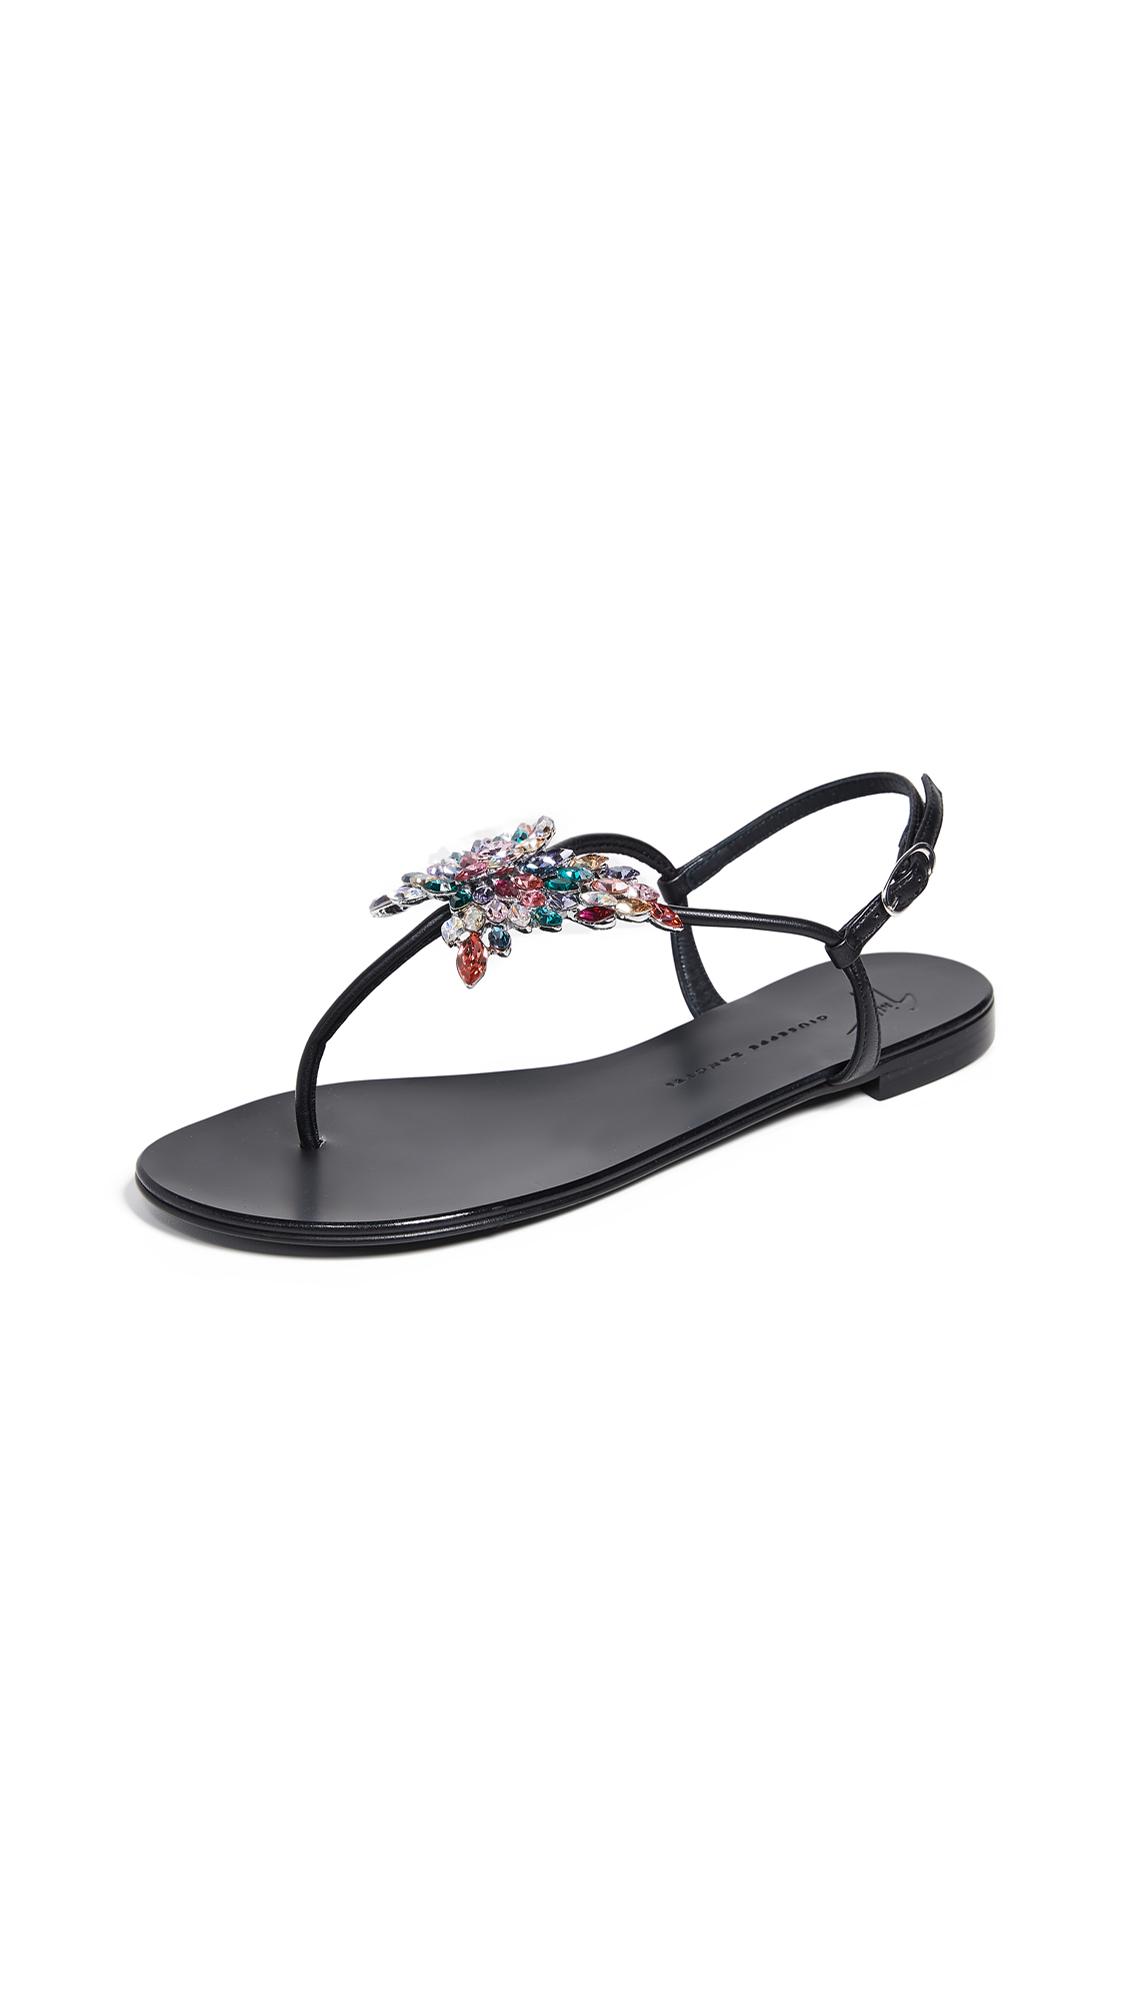 Giuseppe Zanotti Nuvrock 10 Sandals - Nero